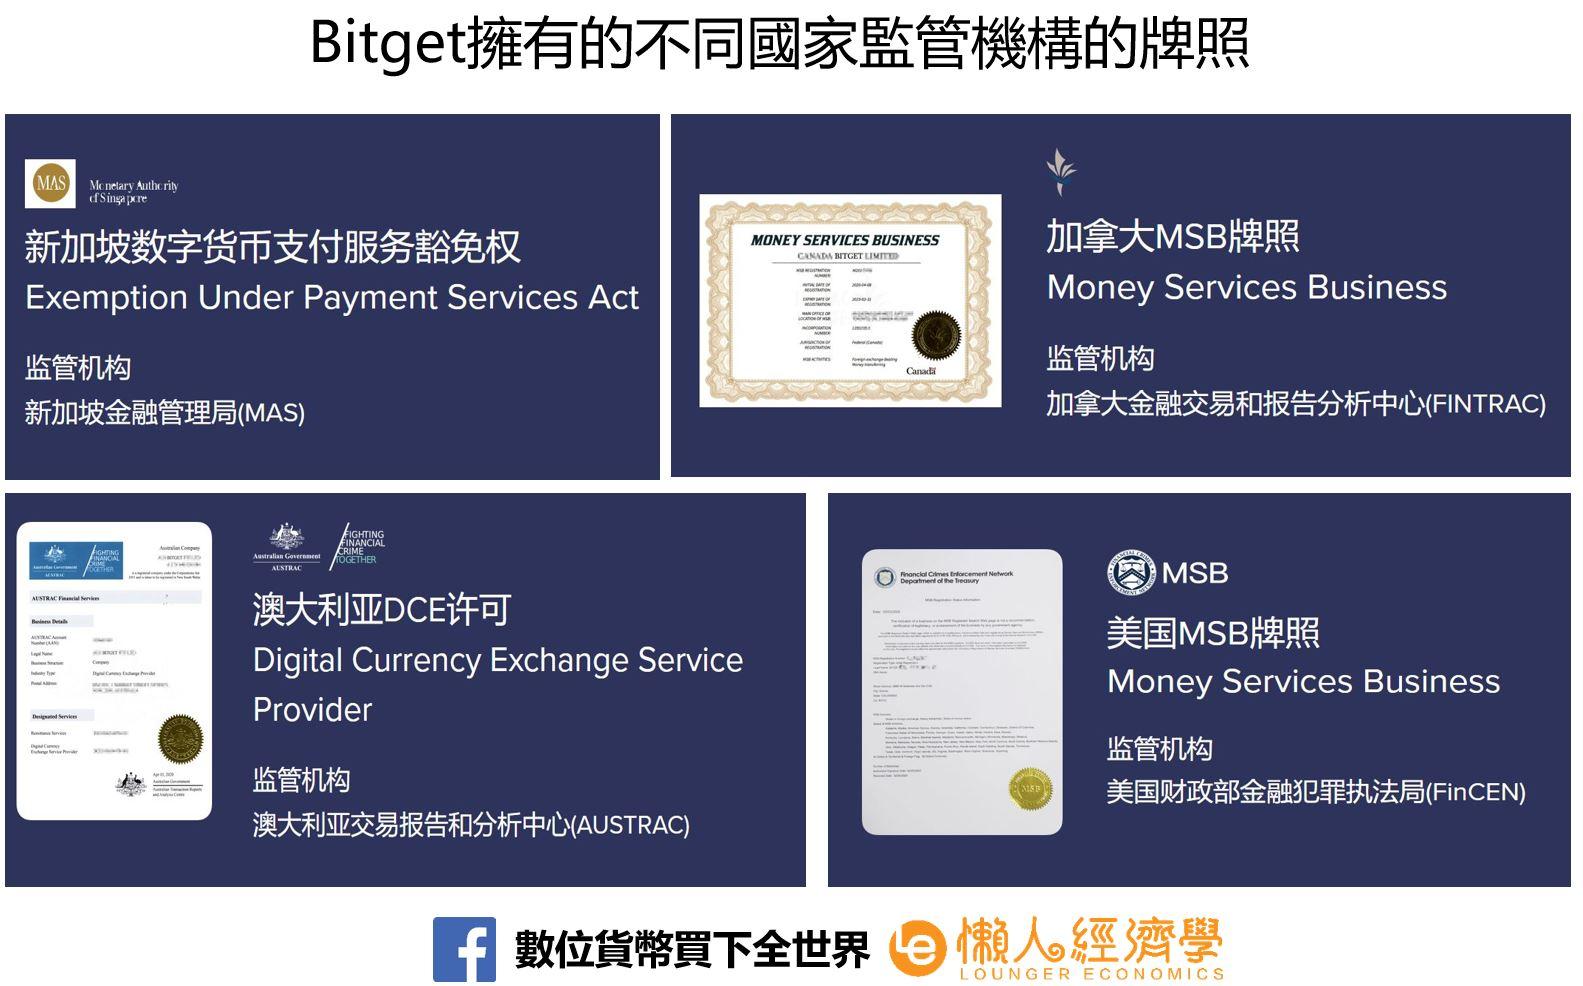 Bitget擁有的不同國家監管機構的牌照